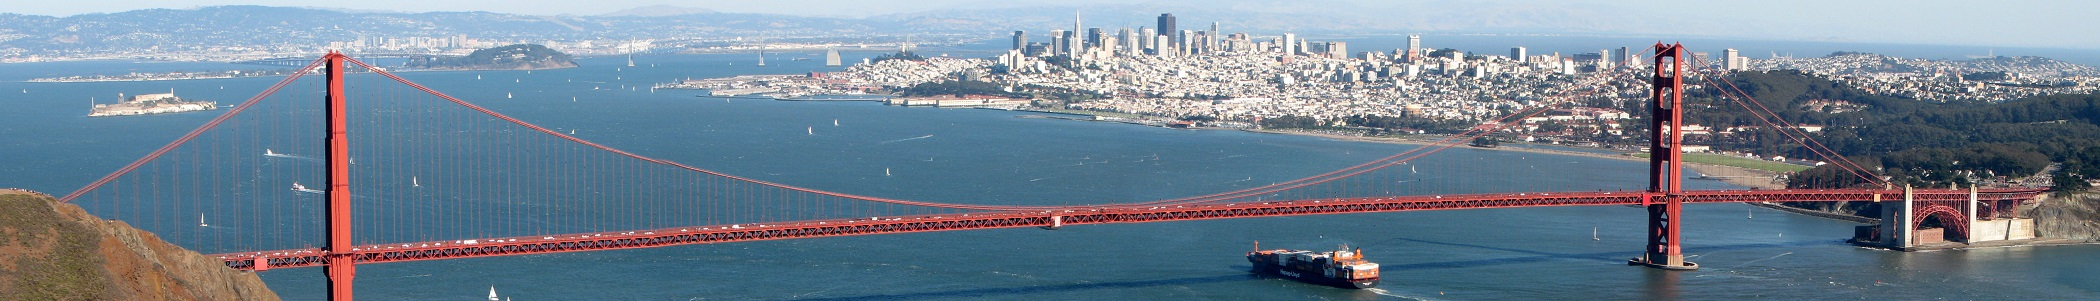 Amazing Golden Gate Bridge Banner